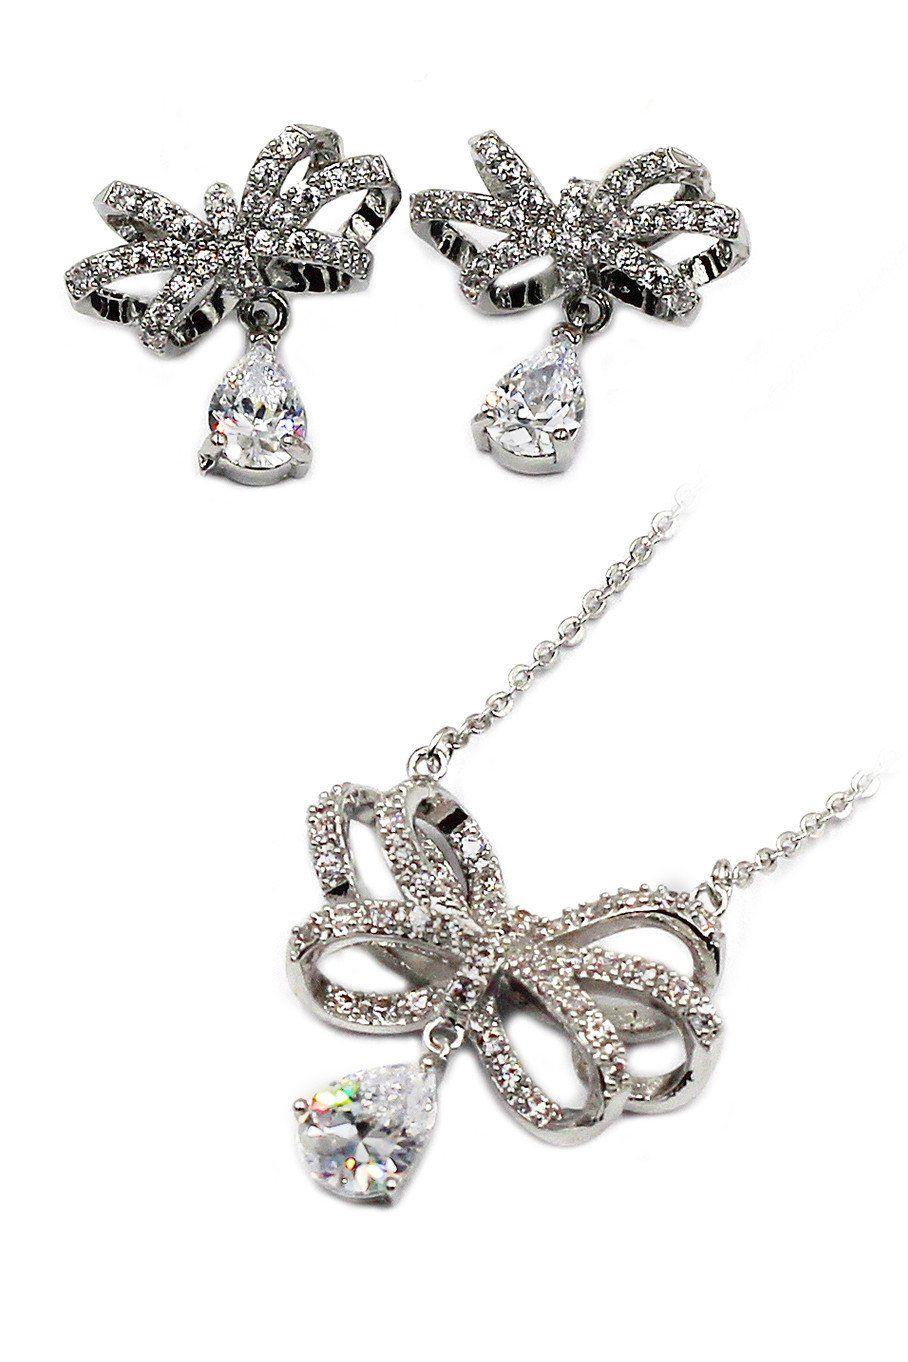 noble bowknot crystal pendant necklace earrings set